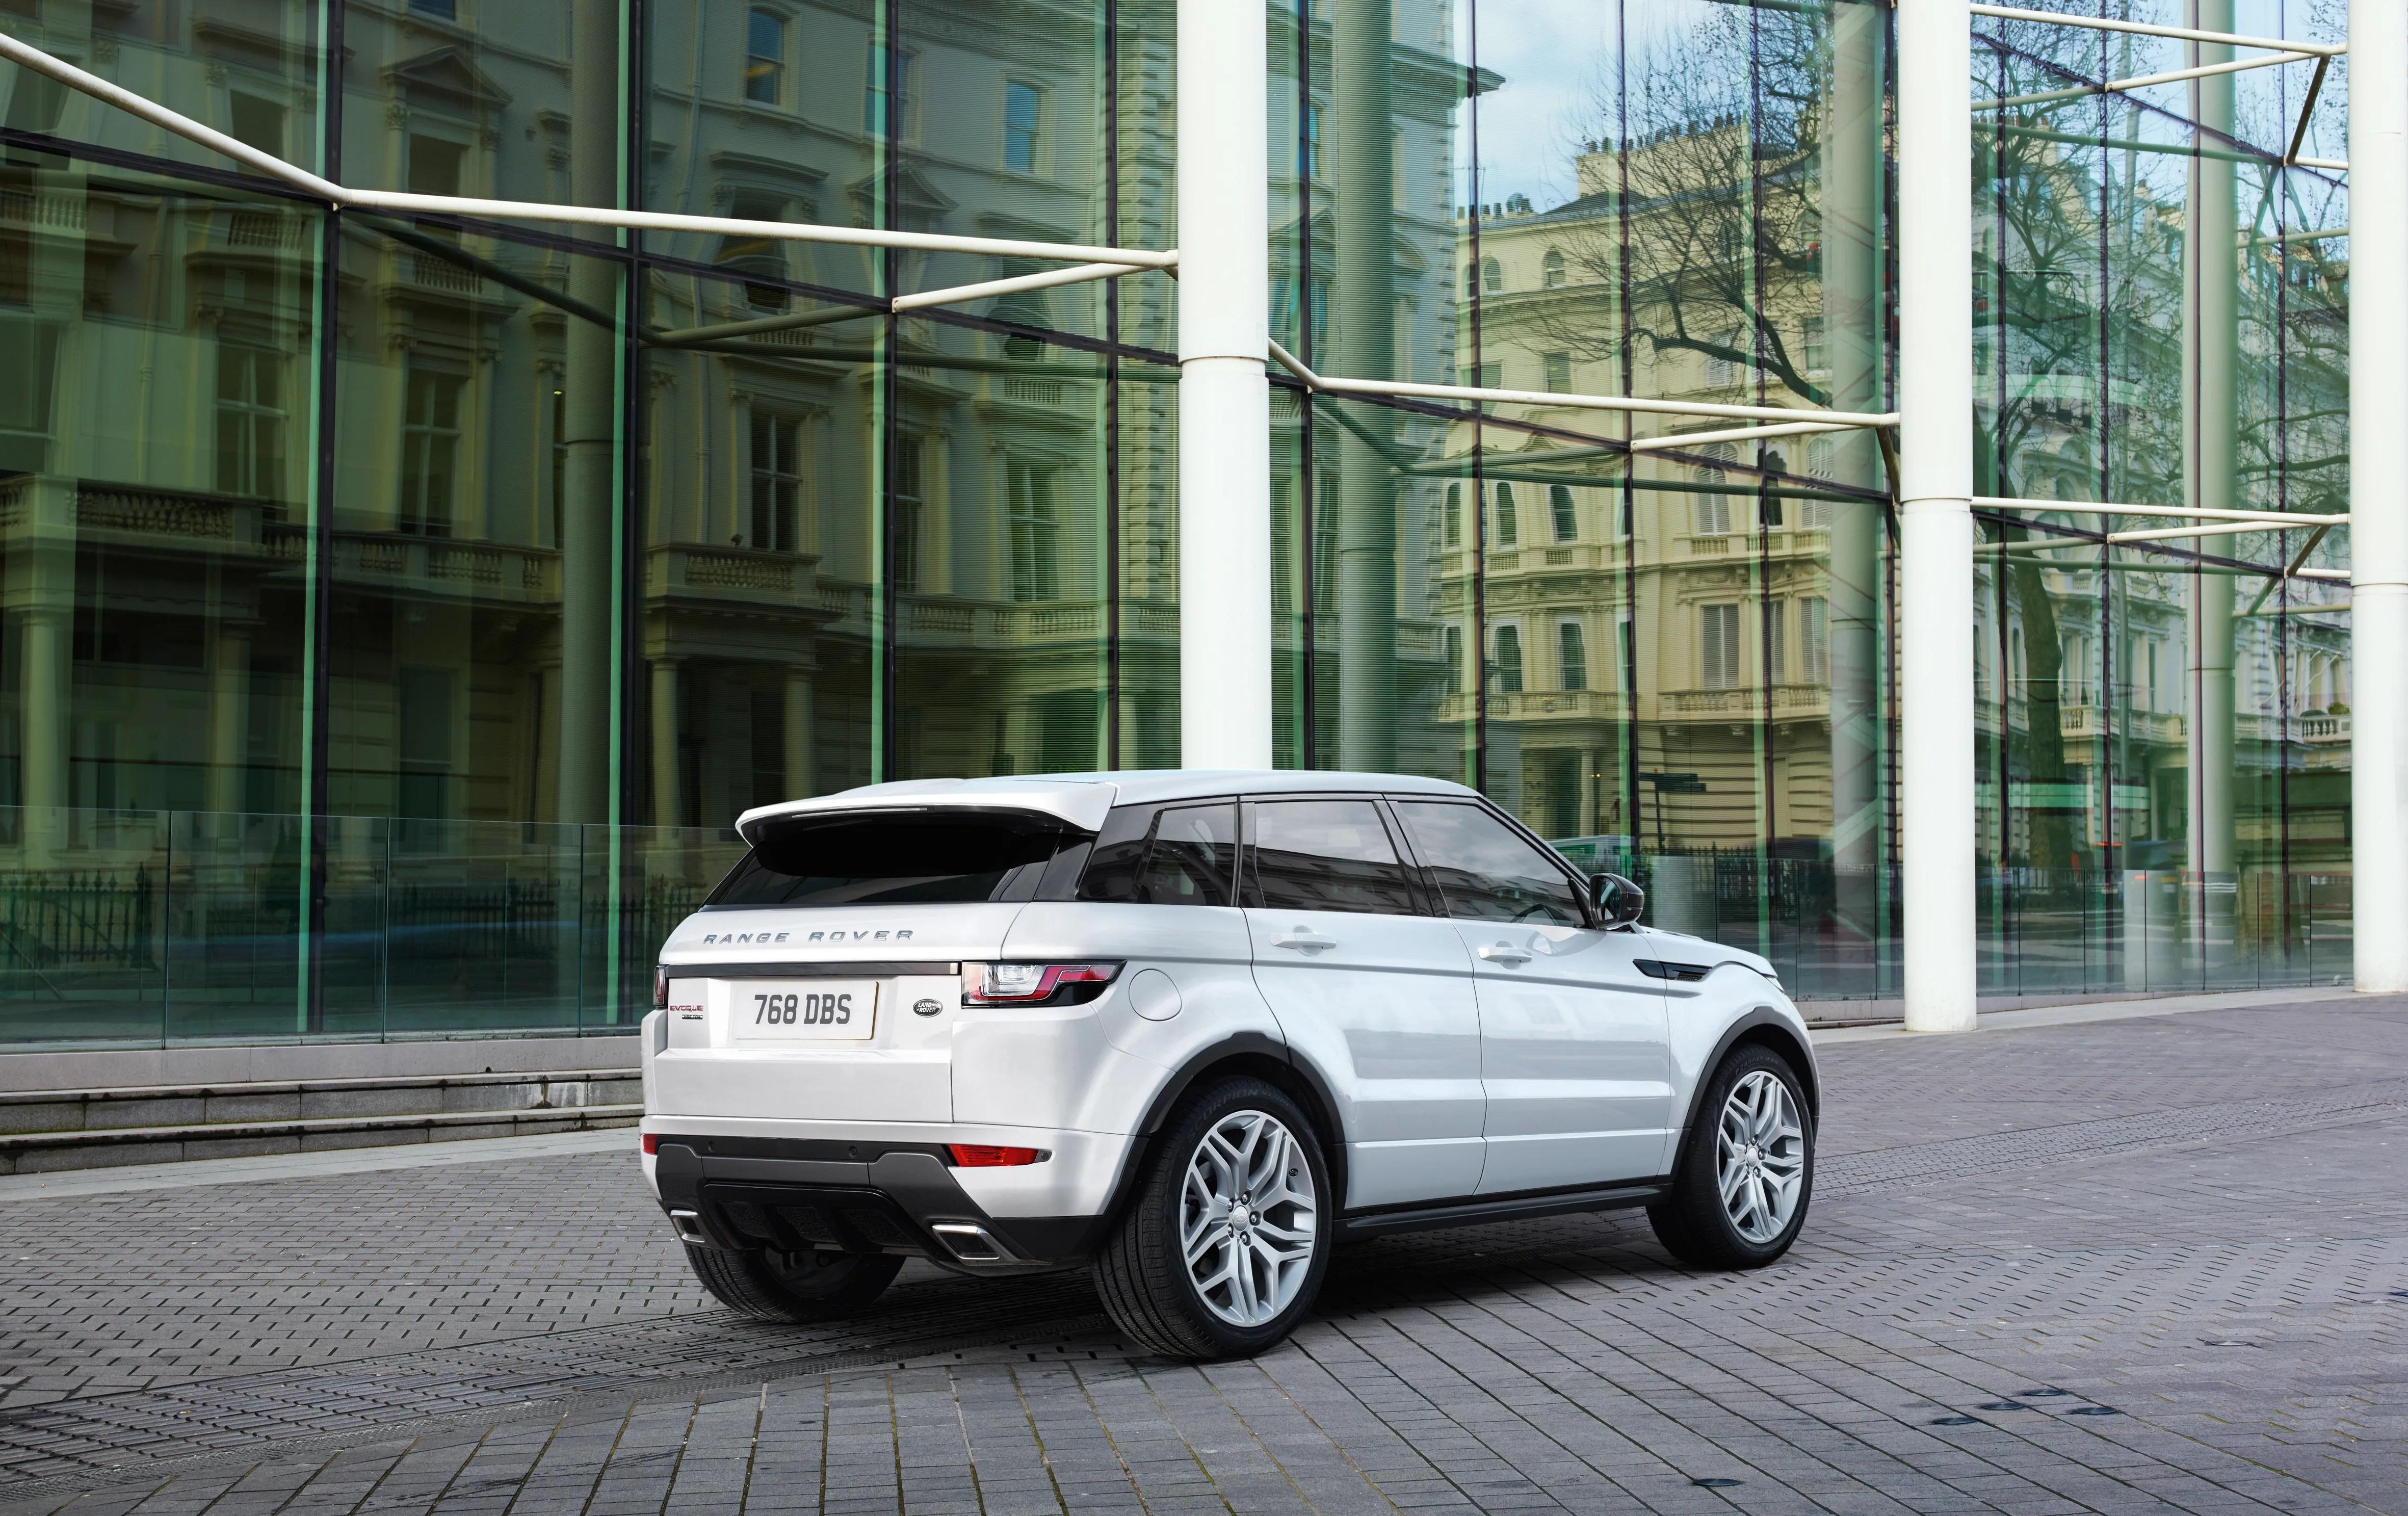 2016 Land Rover Range Rover Evoque Review Top Speed